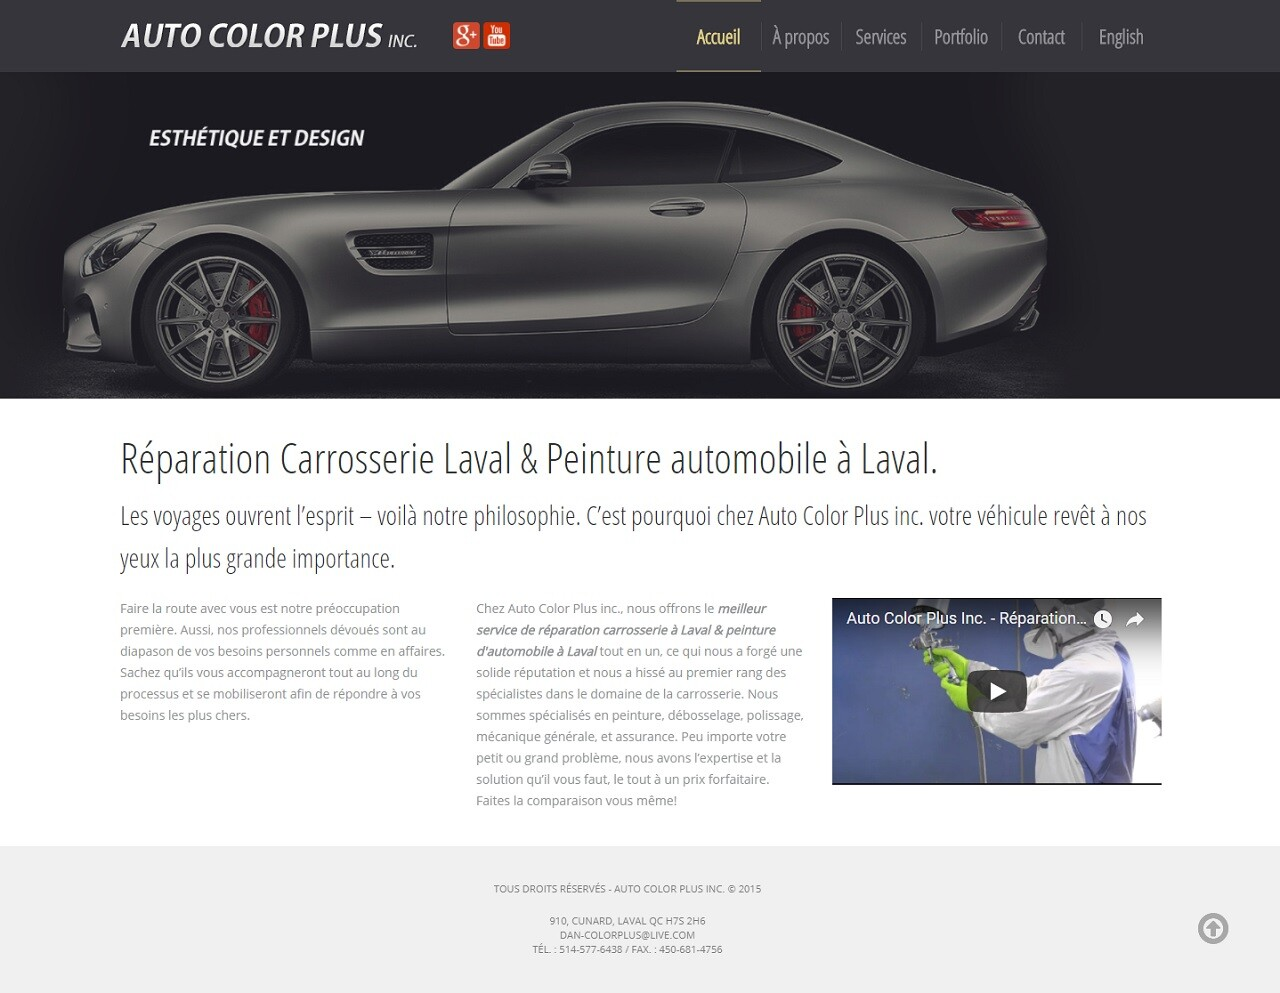 Auto Color Plus, WebCie portfolio, photo